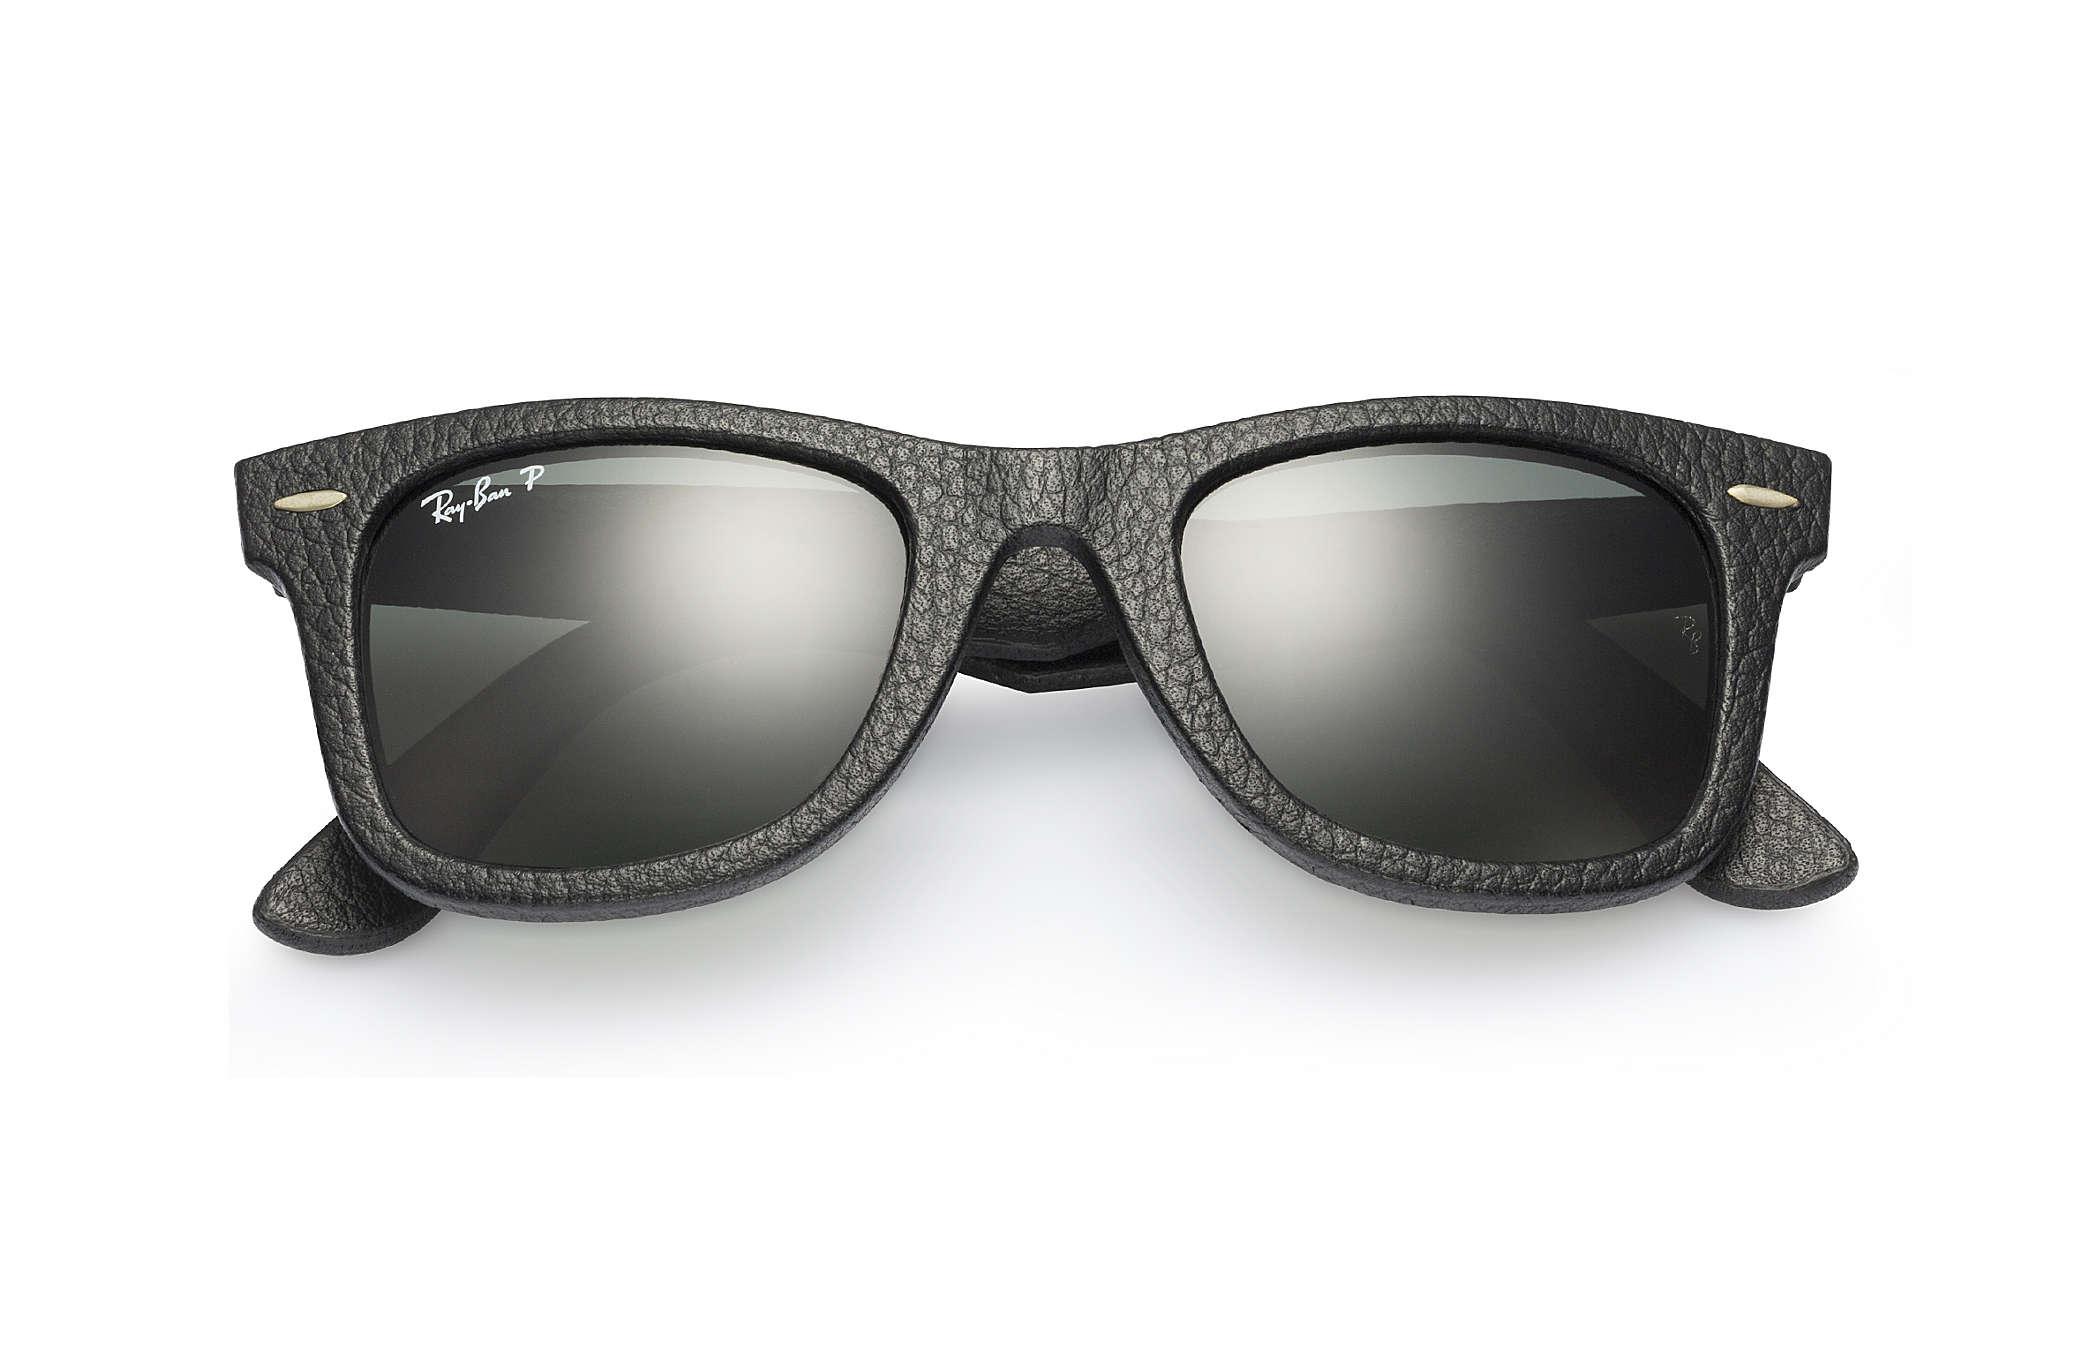 Ray ban sunglasses with price - Ray Ban 0rb2140qm Wayfarer Leather Black Sun